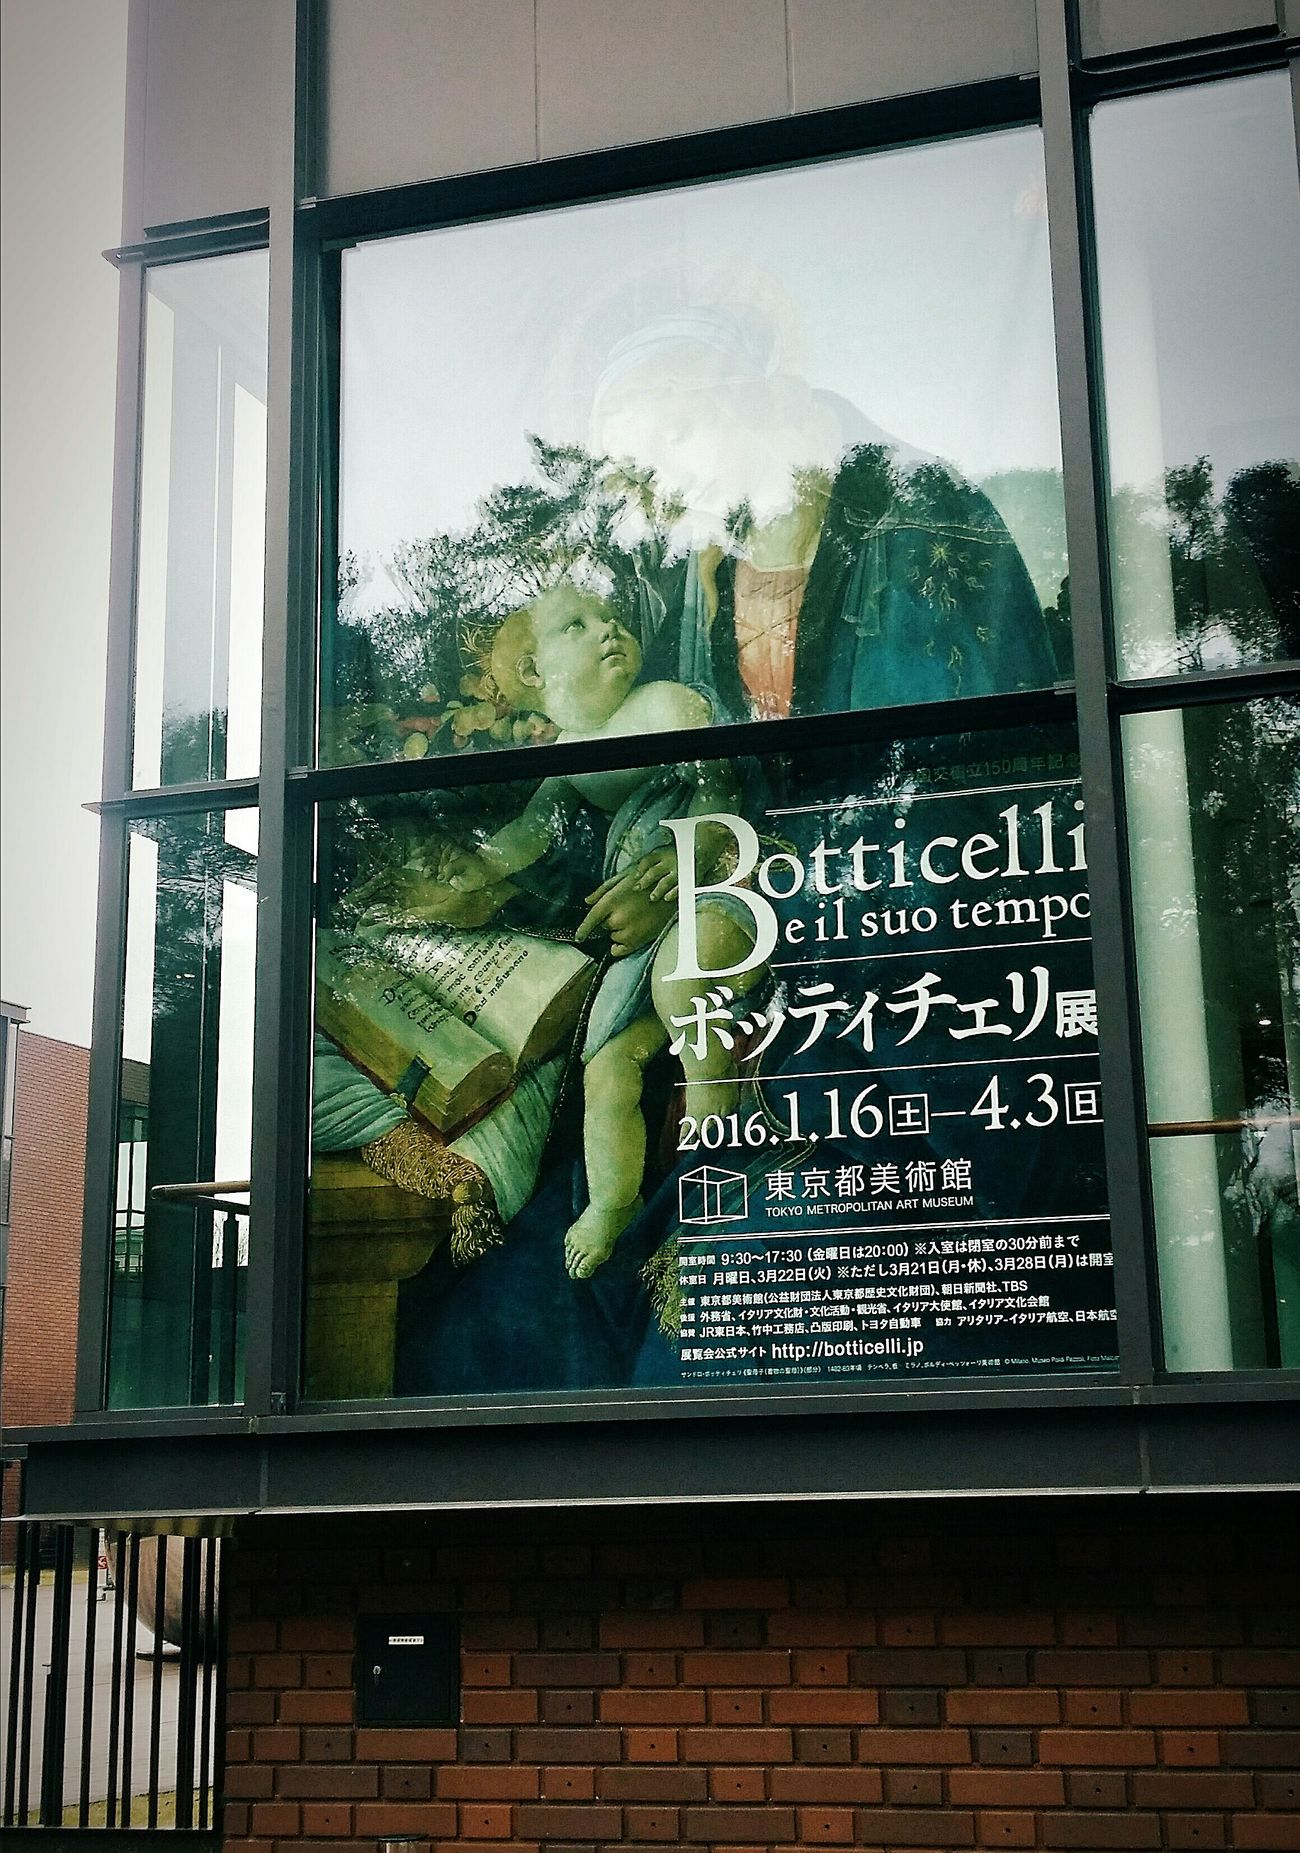 Botticelli Sandro Botticelli 1445-1510 Art Exhibition Tokyometropolitanartmeseum Poster Tokyo Japan Art EyeEM Tokyo